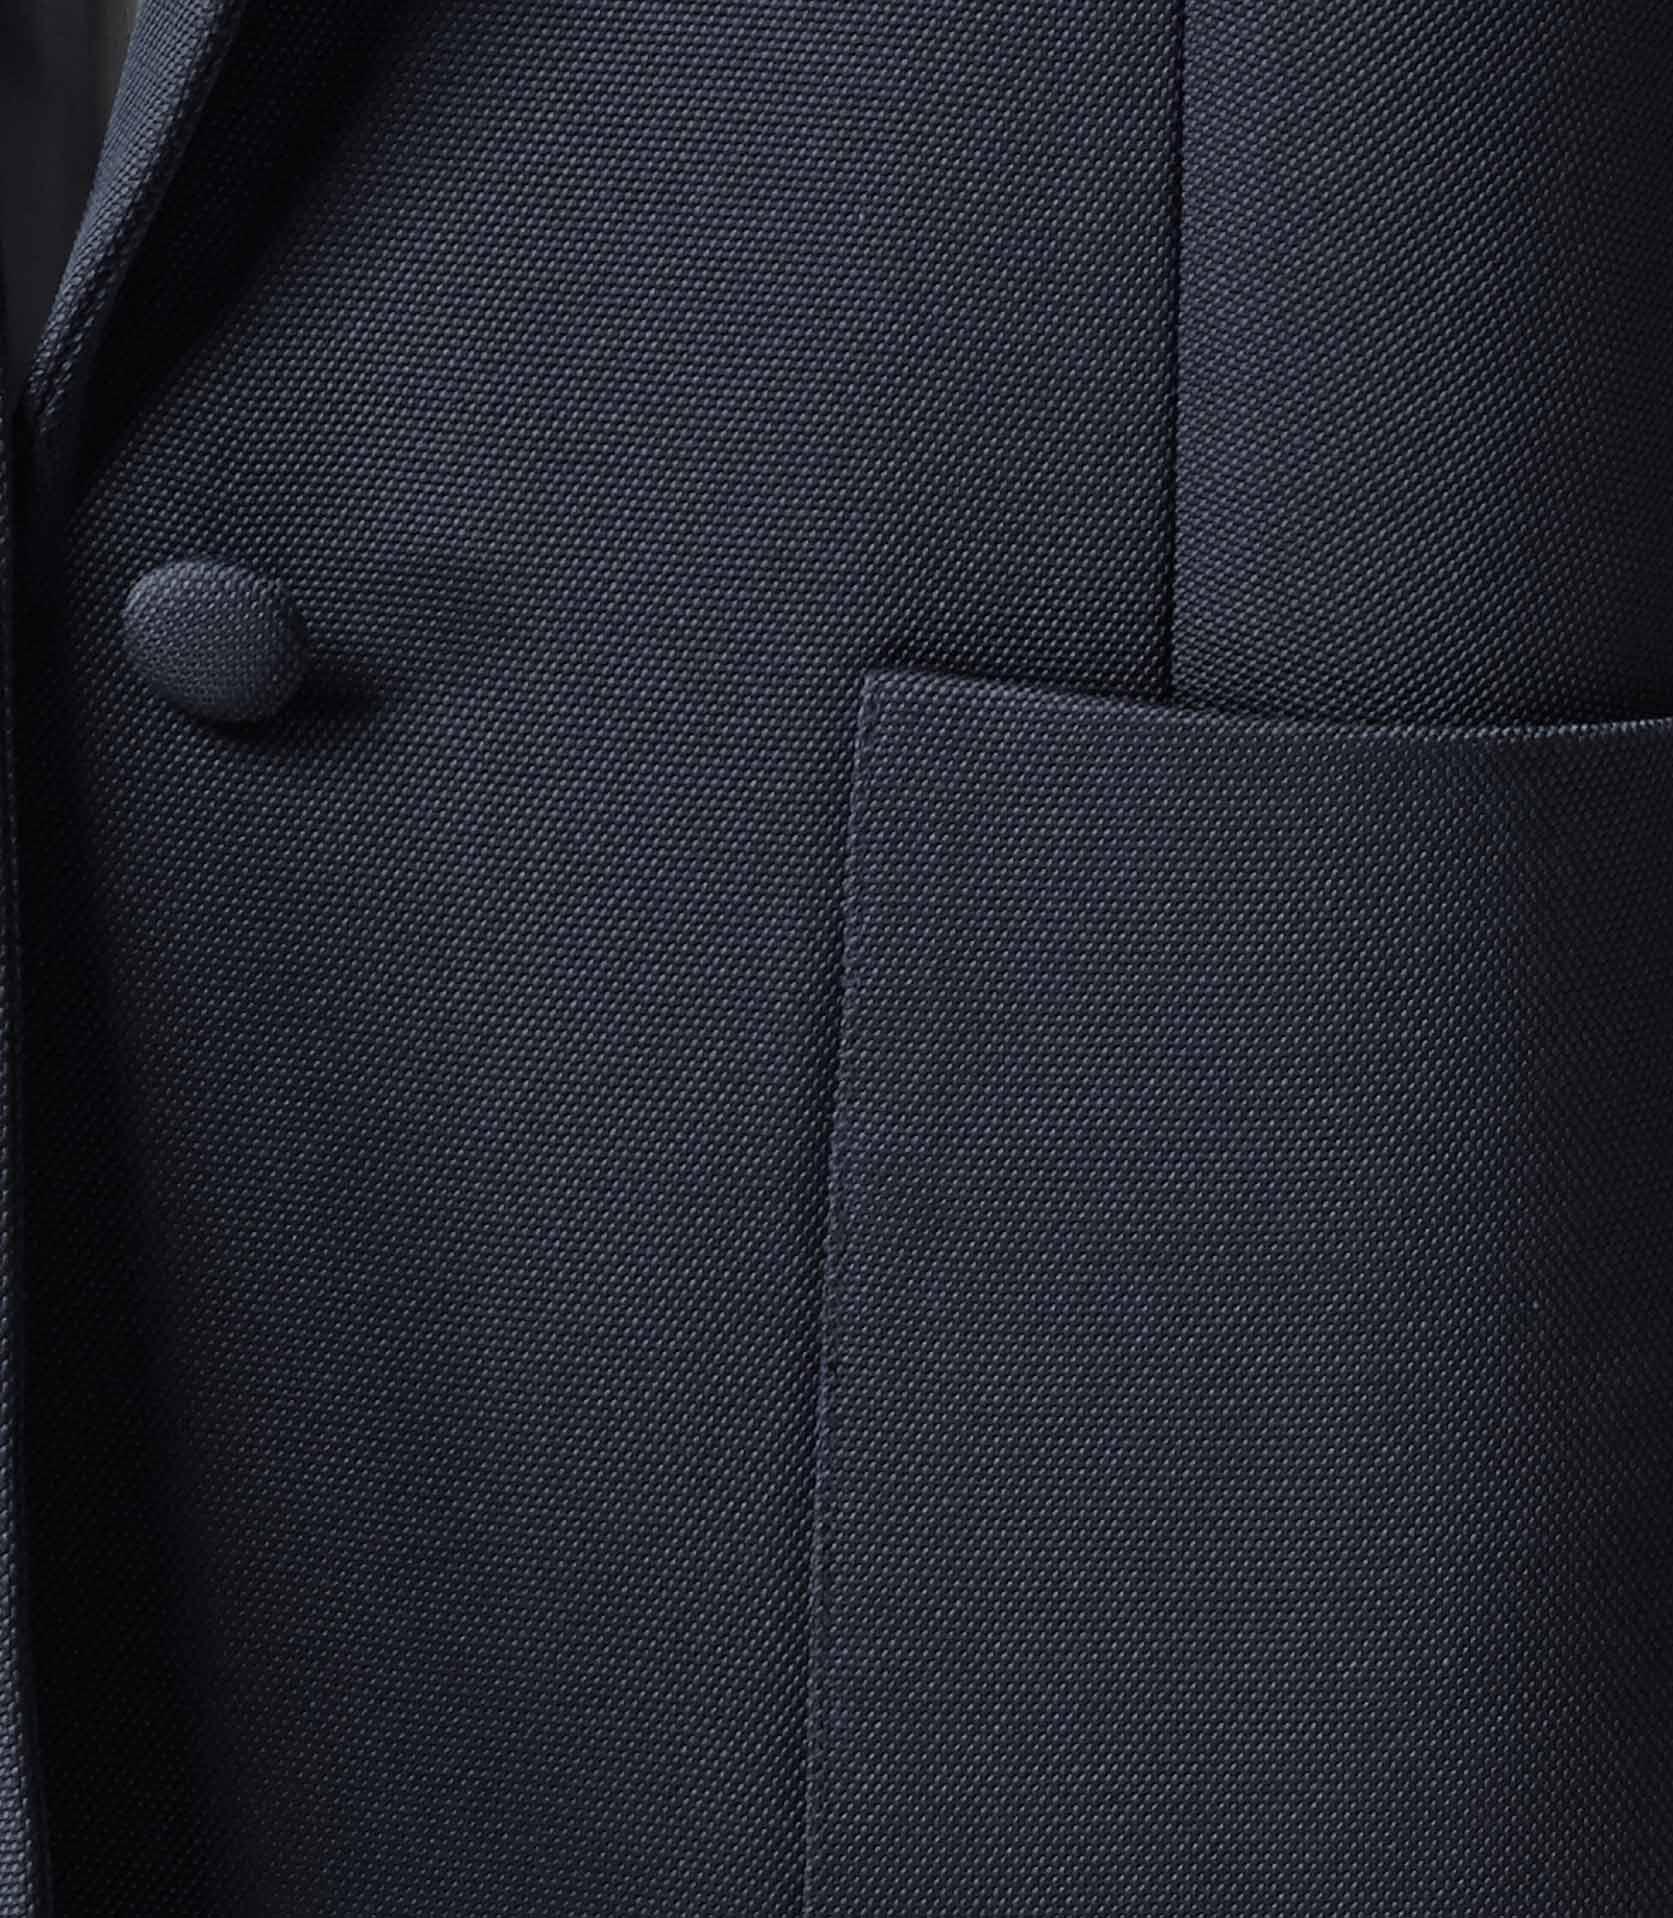 Cyan Lux Navy Relaxed Tuxedo Blazer - REISS